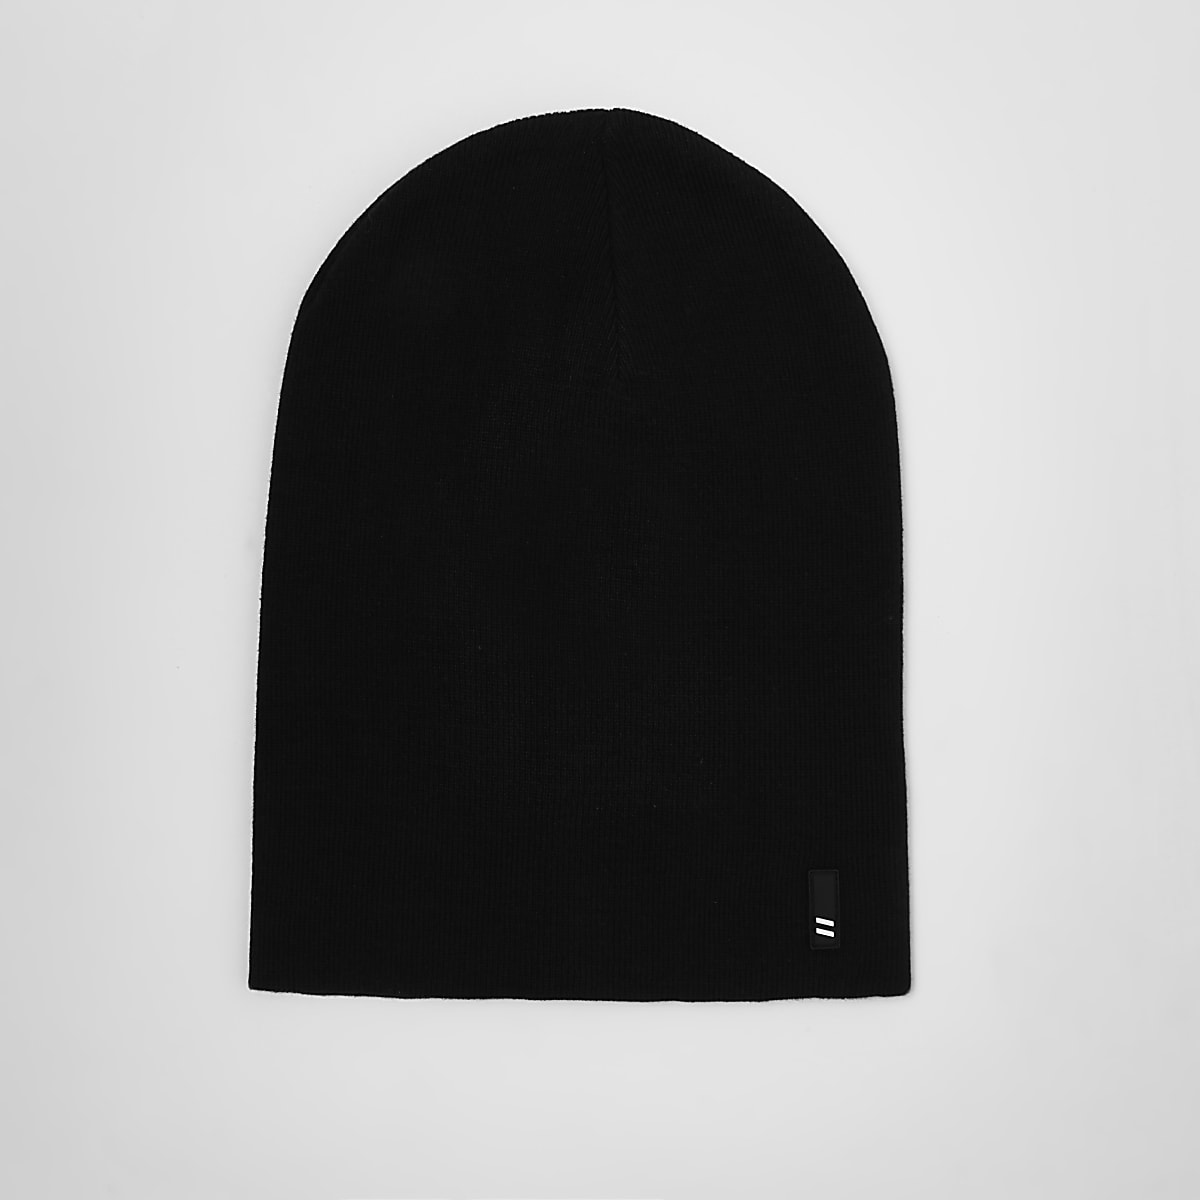 cd0a03d5a00 Black slouchy beanie hat - Hats   Caps - Accessories - men